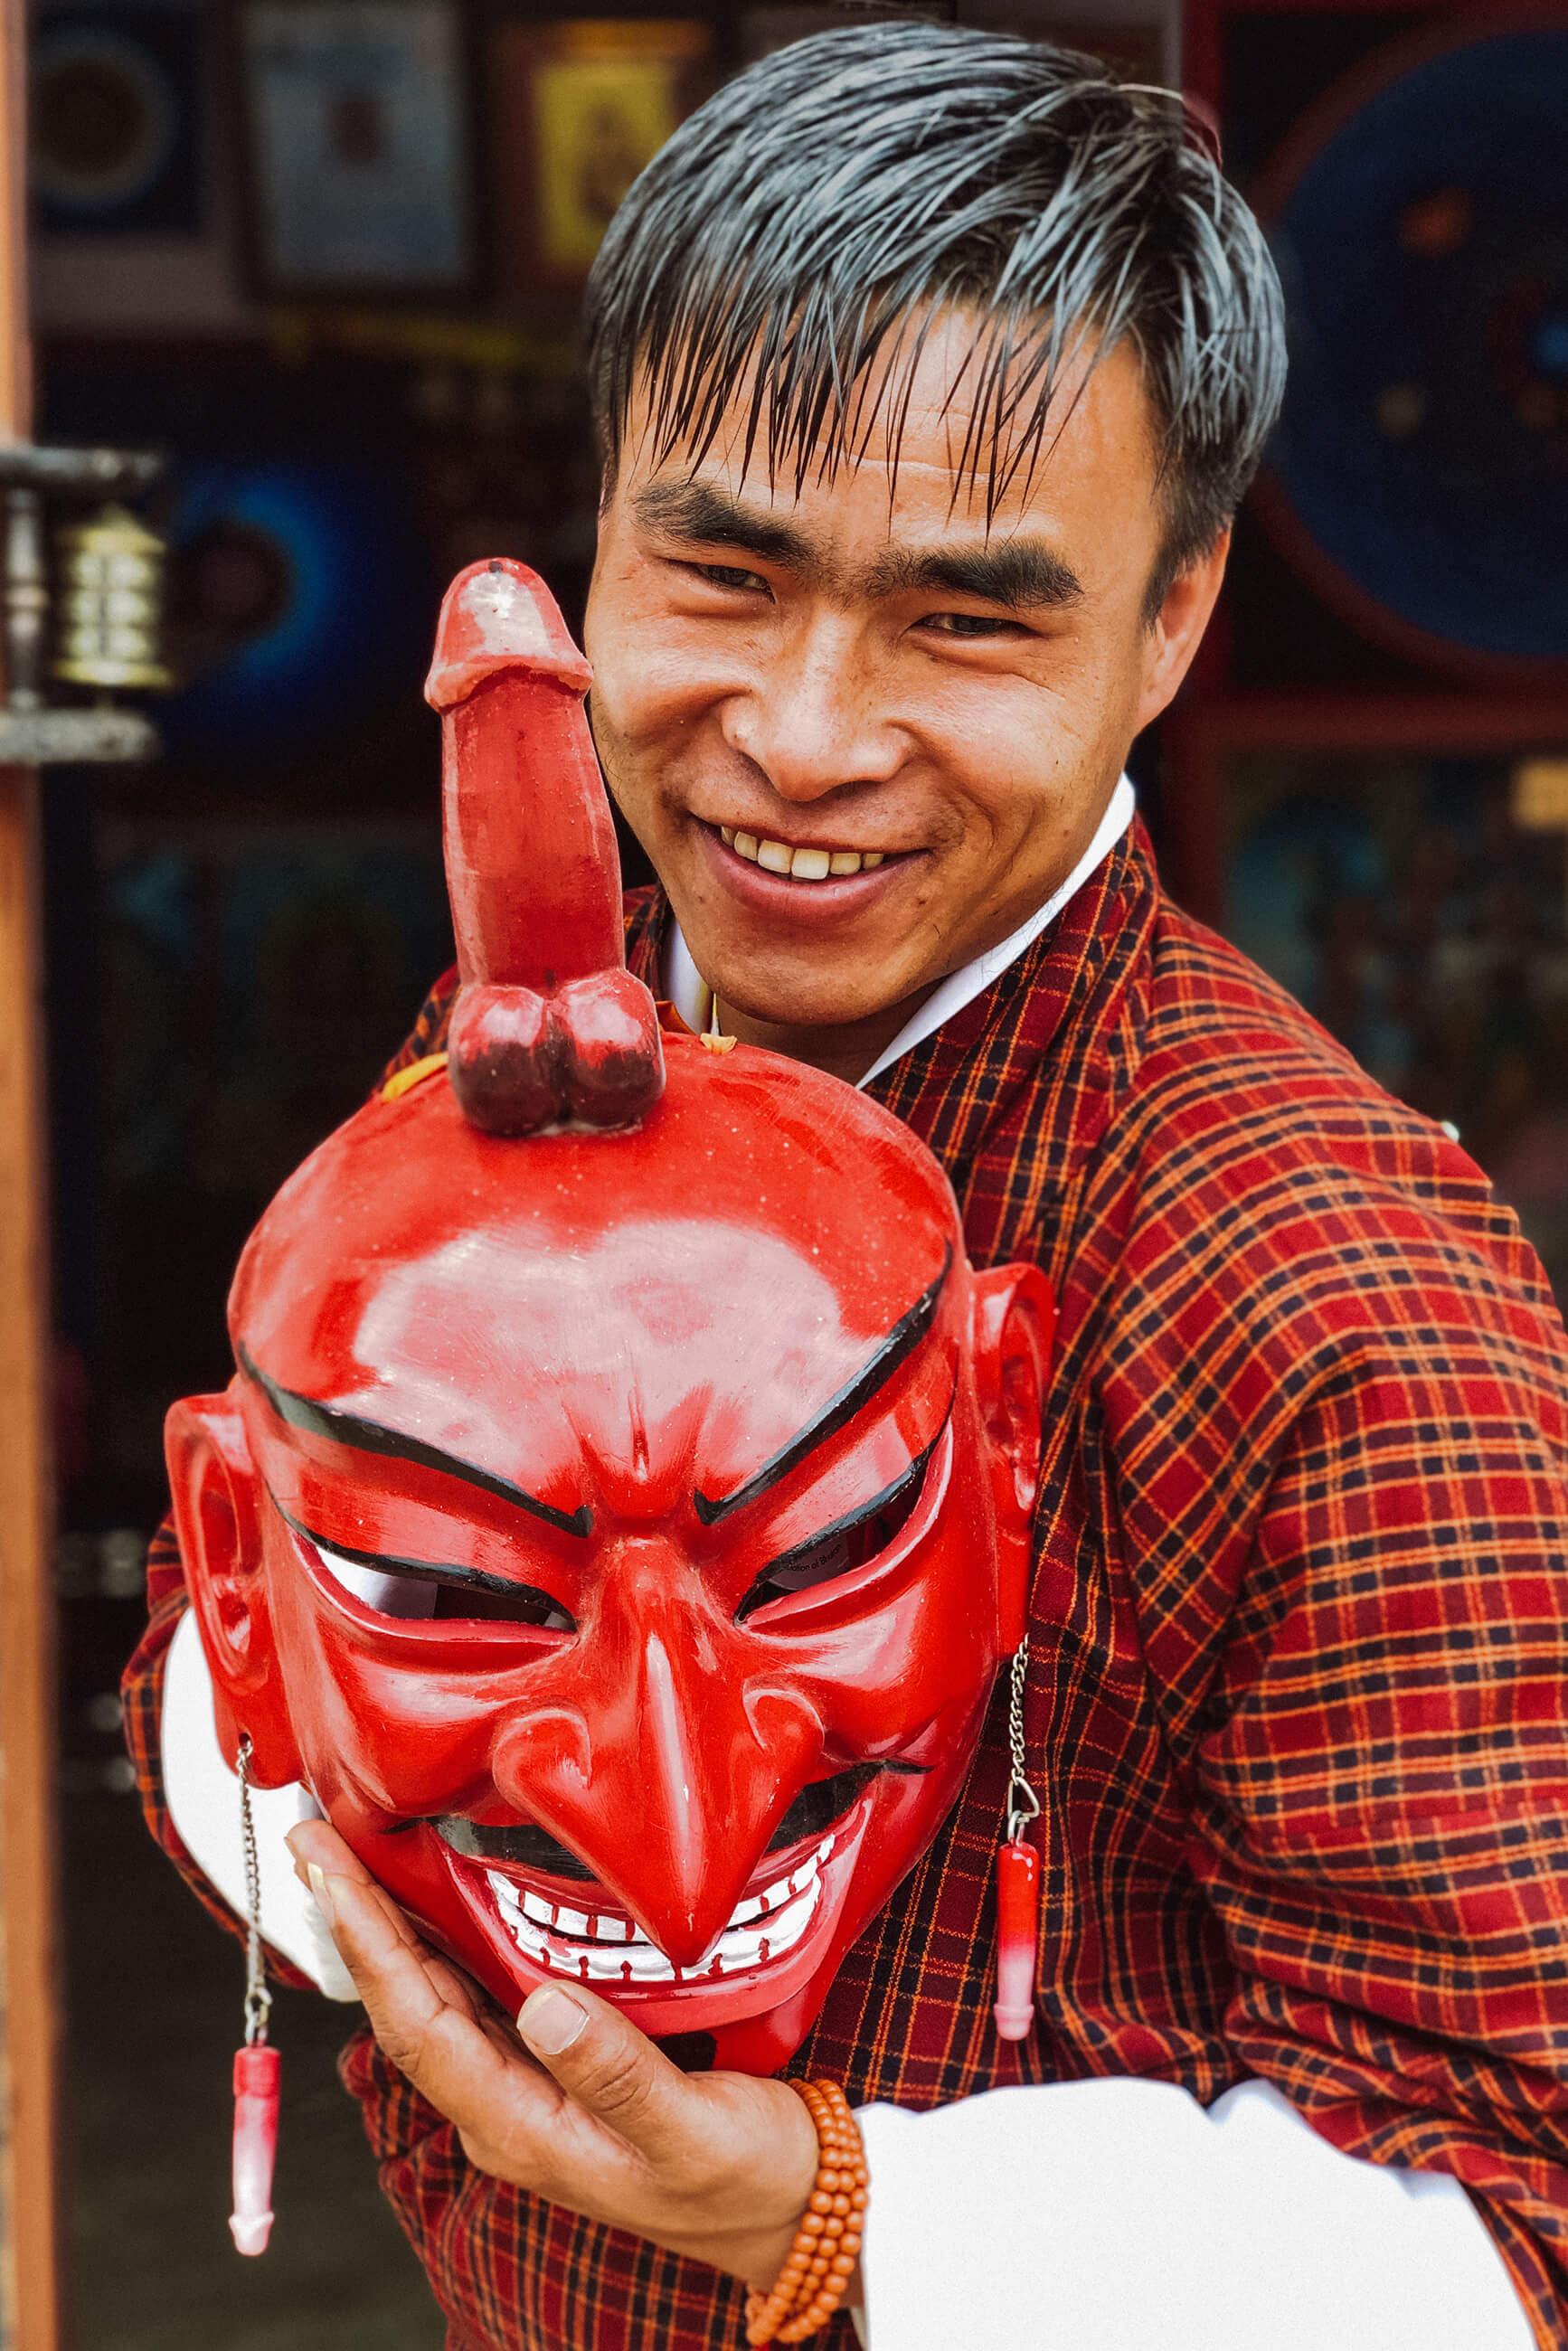 https://bubo.sk/uploads/galleries/4914/roberttaraba_bhutan_local3-6.jpg